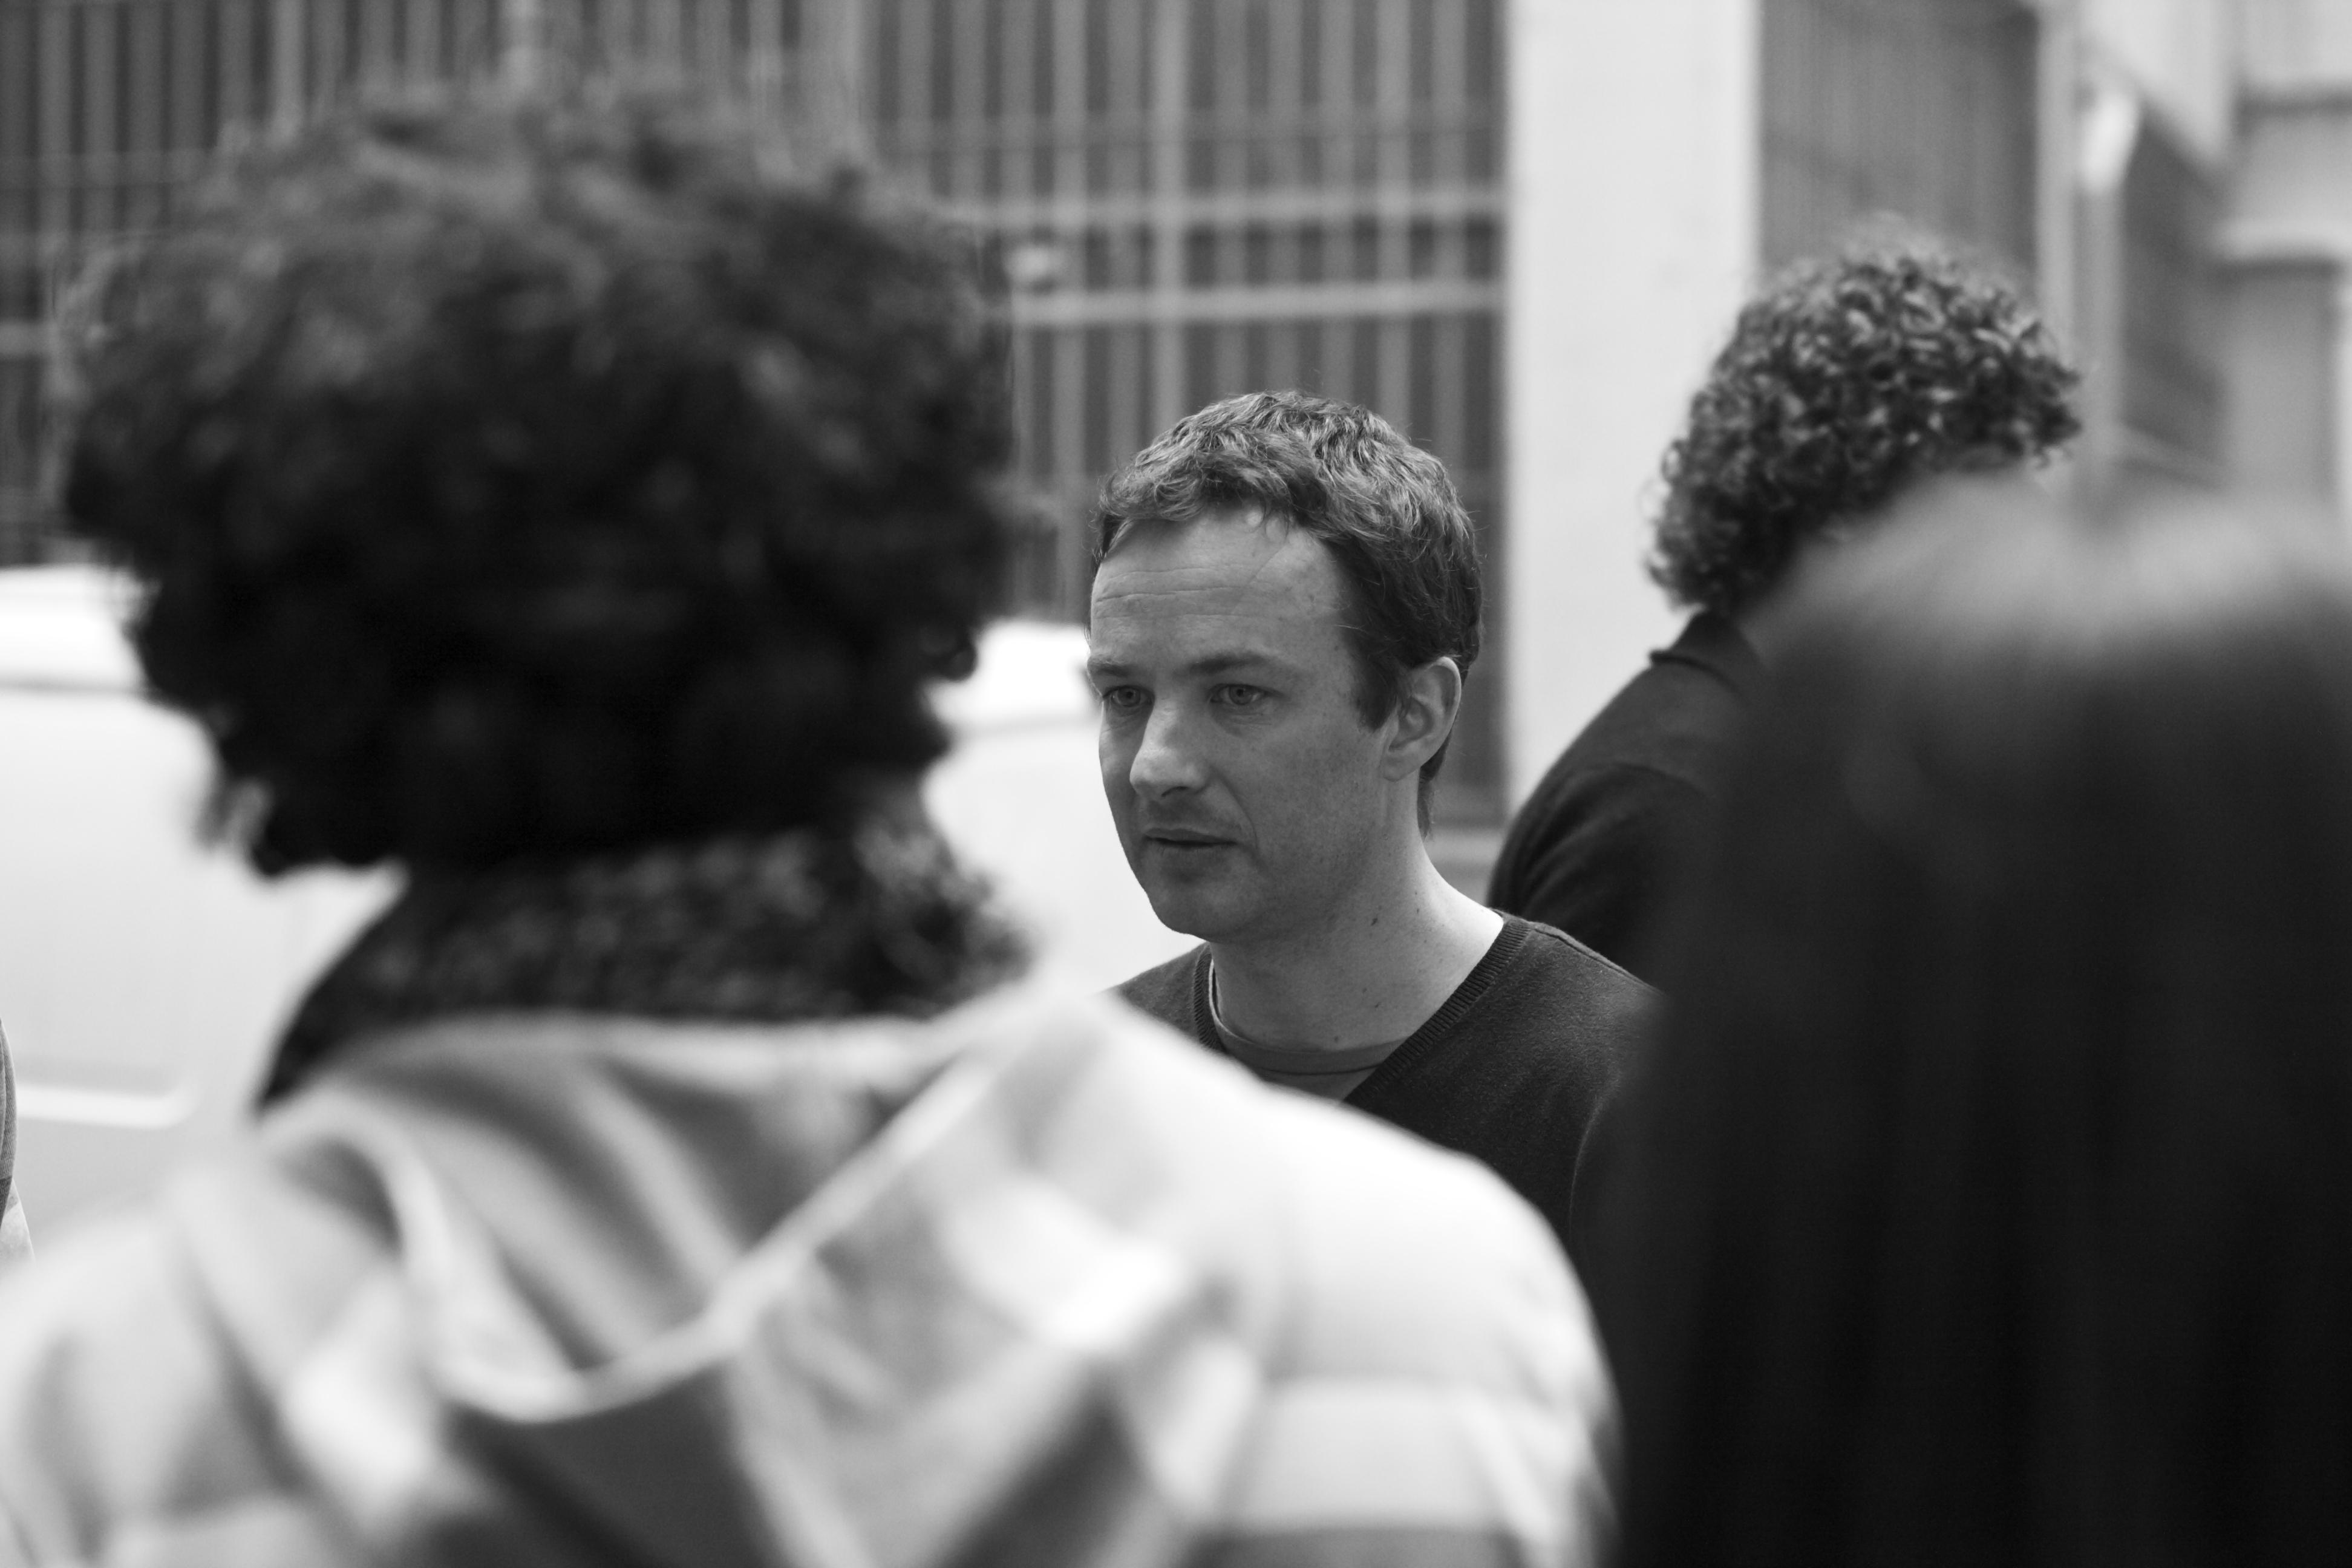 Flickr - Aron Demetz - Dialoghi e materia - Workshop a cura di Franco Reina51